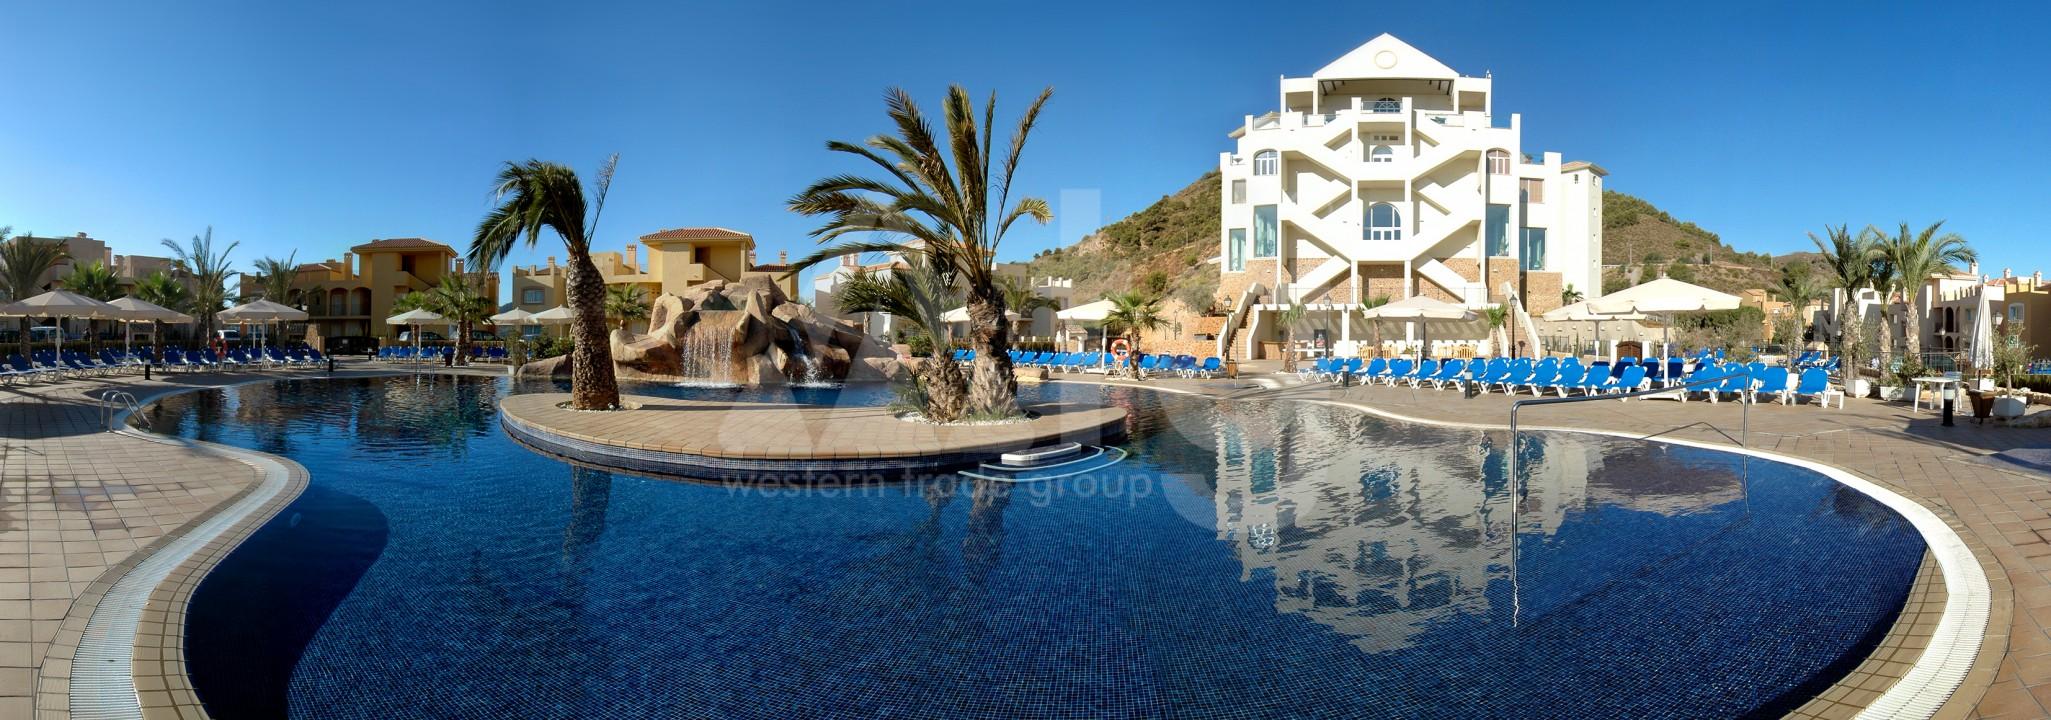 3 bedroom Villa in Cabo Roig  - IM116752 - 23